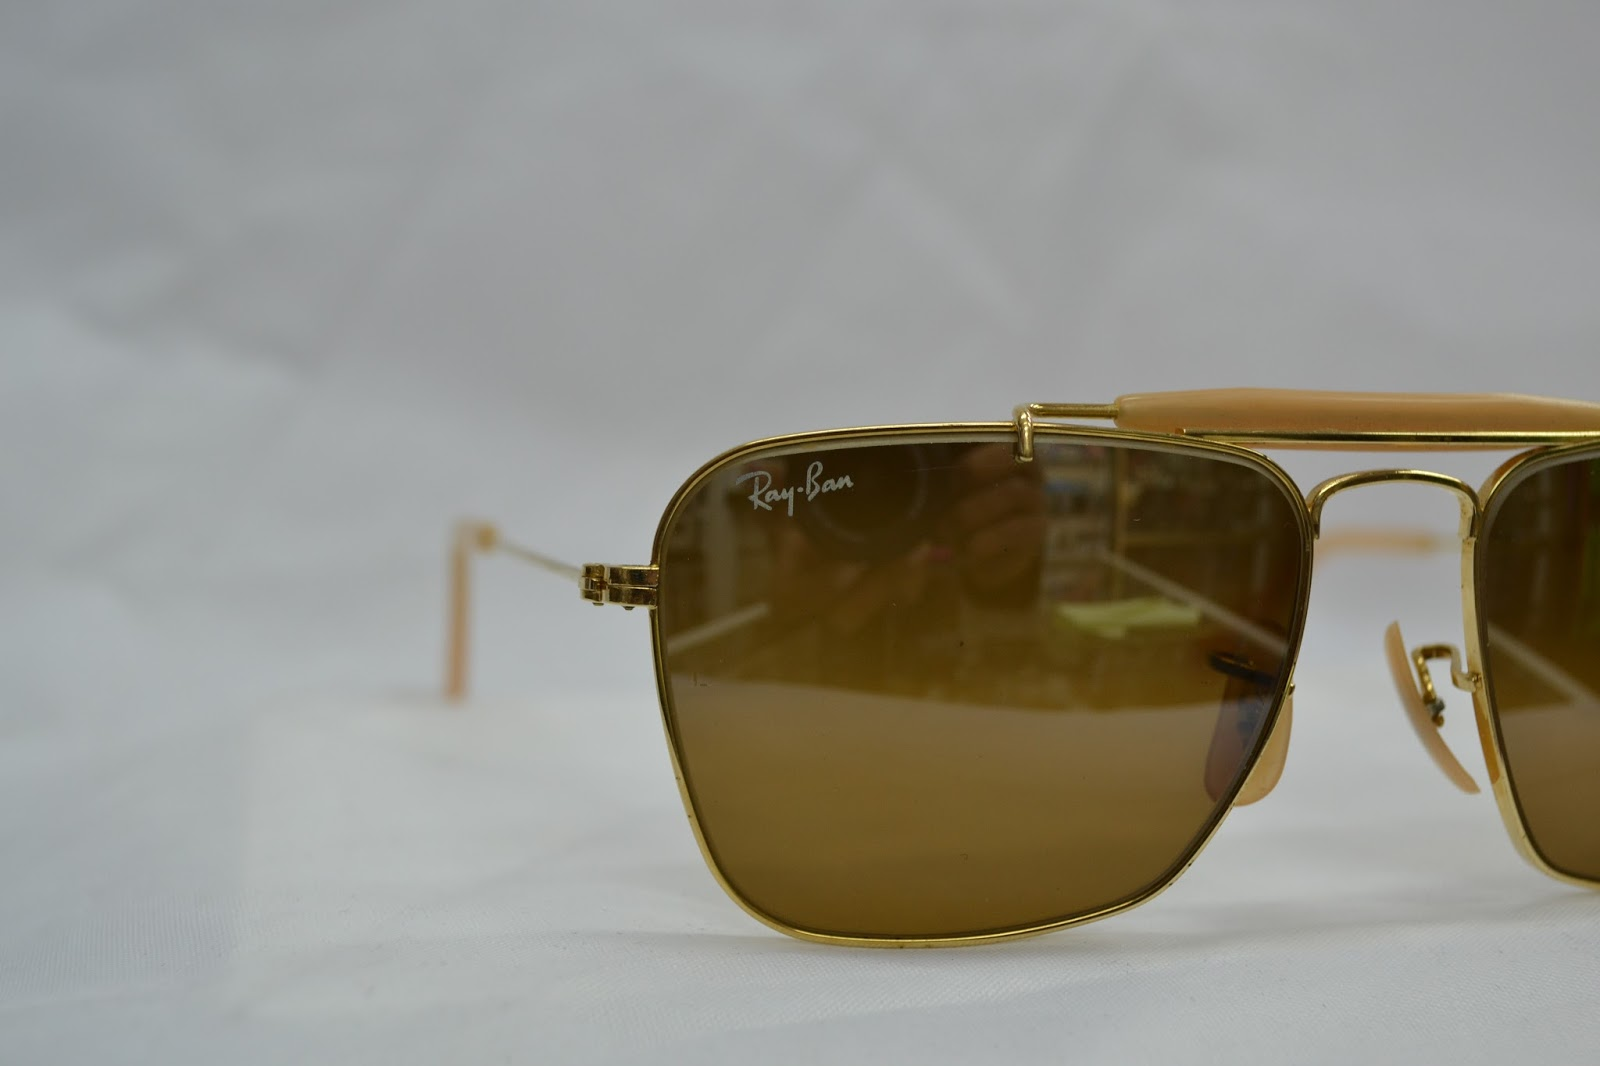 73ec60fc1a8 Vintage sunglass  Vintage Ray Ban caravan mirror lens! w1348! NOS! USA!